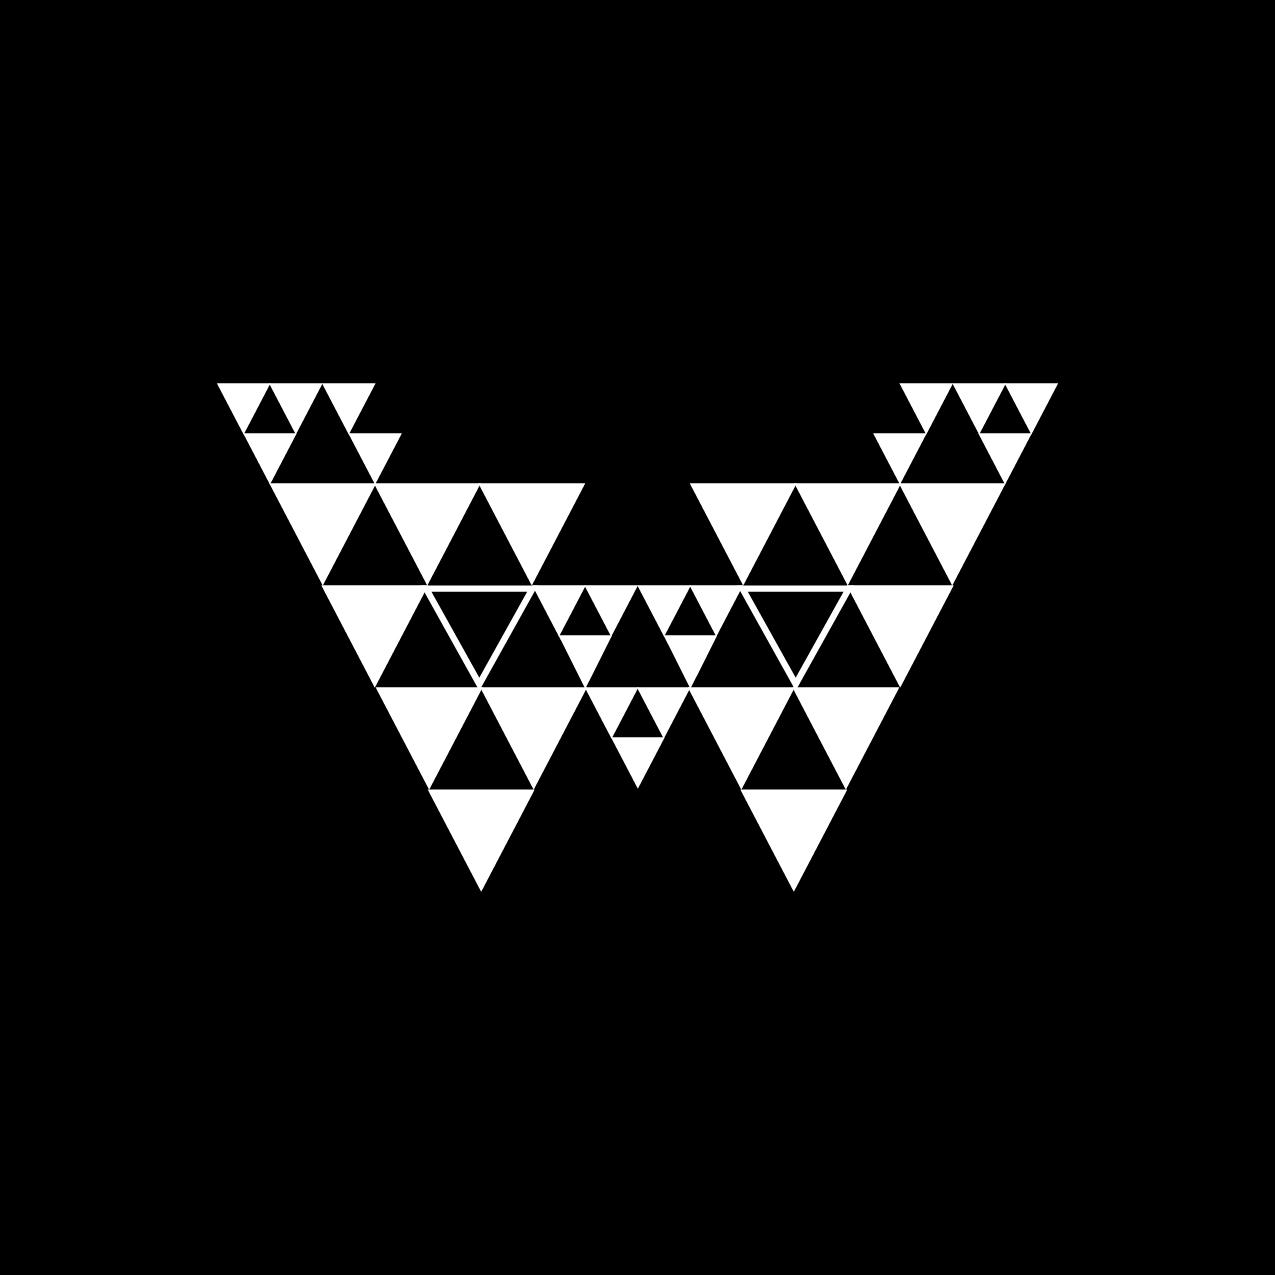 Letter W5 Design by Furia